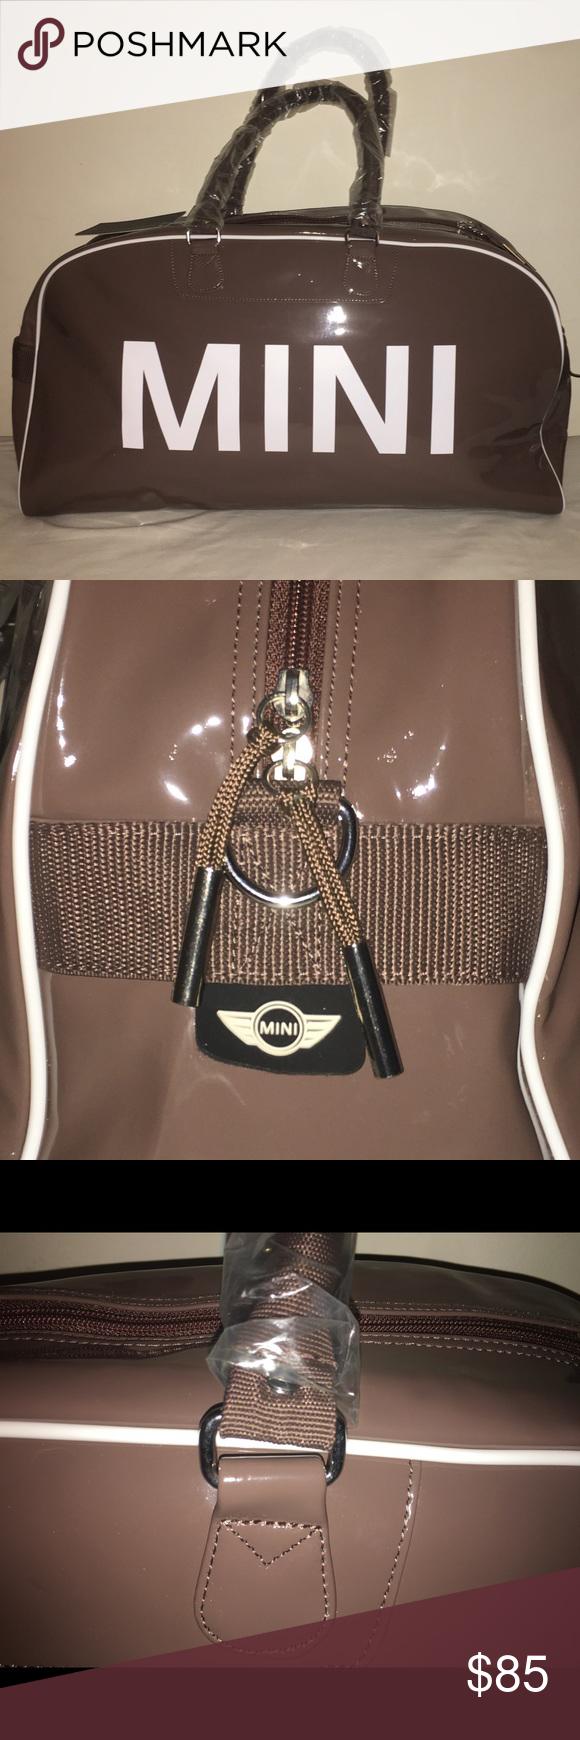 Mini Cooper Duffle Bag Chocolate Brown Large Mini Duffle Bag Bags Duffle